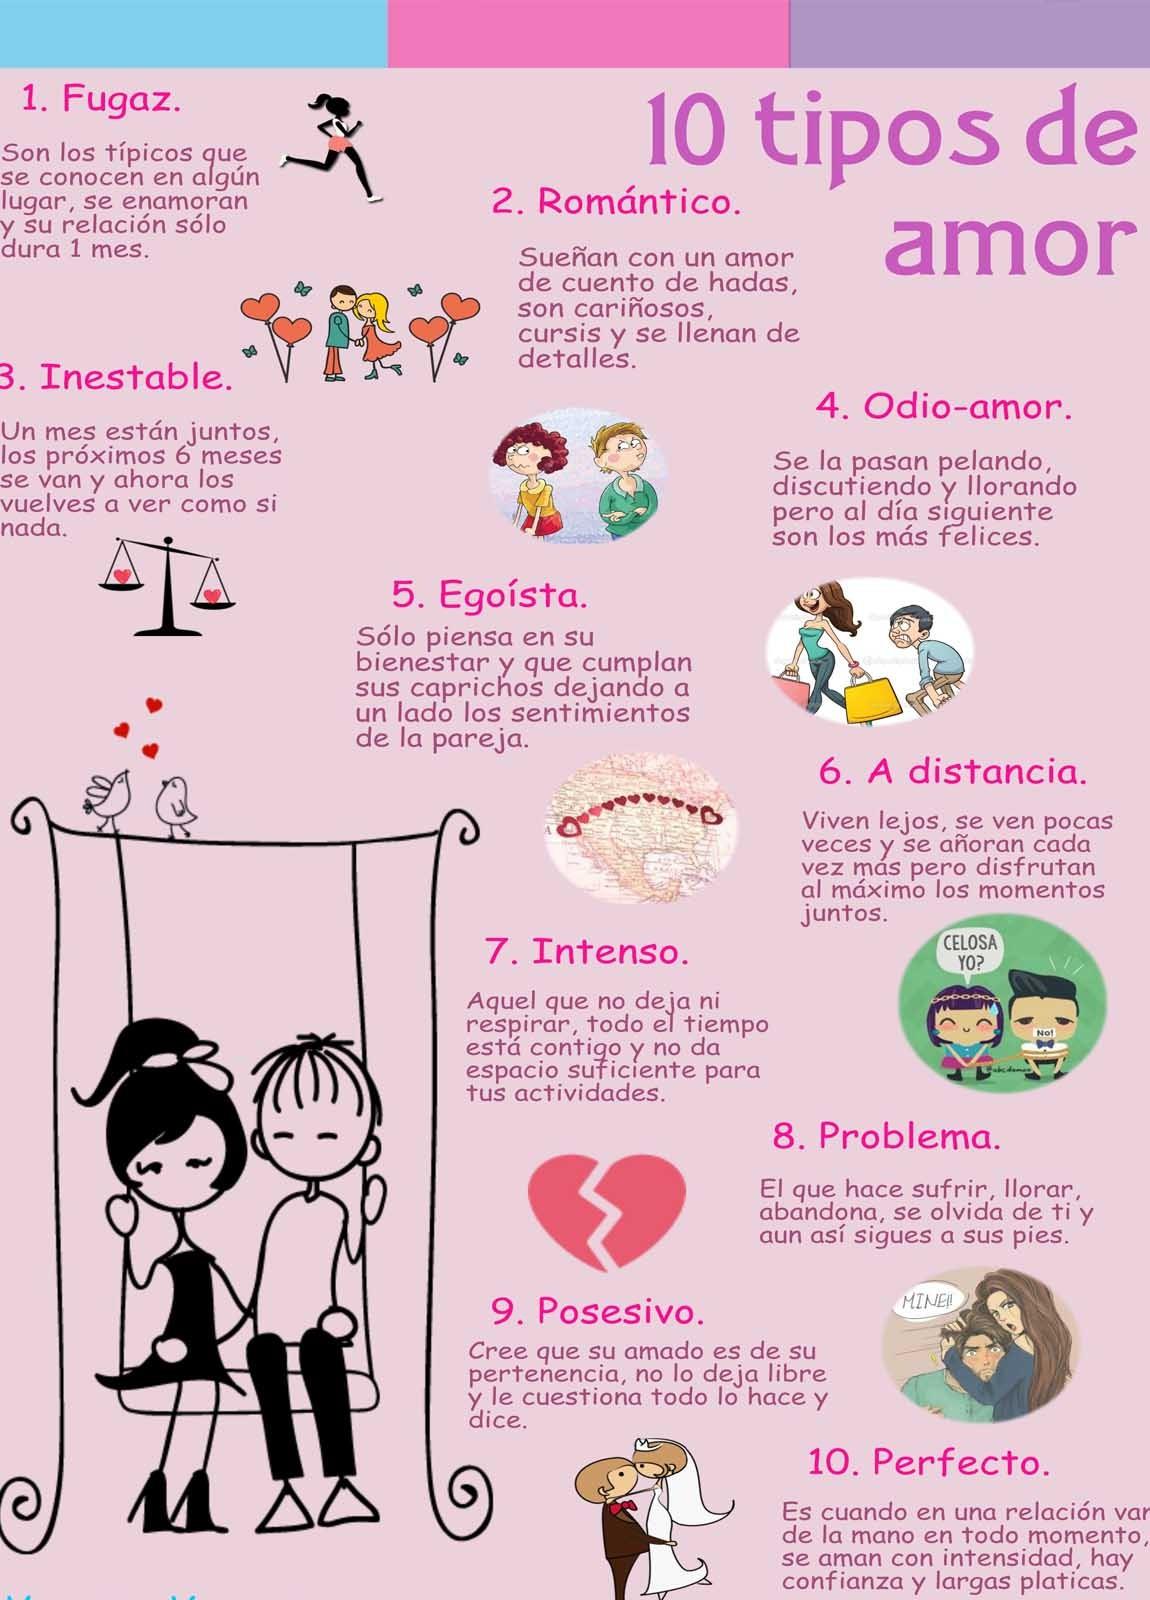 10 TIPOS DE AMOR